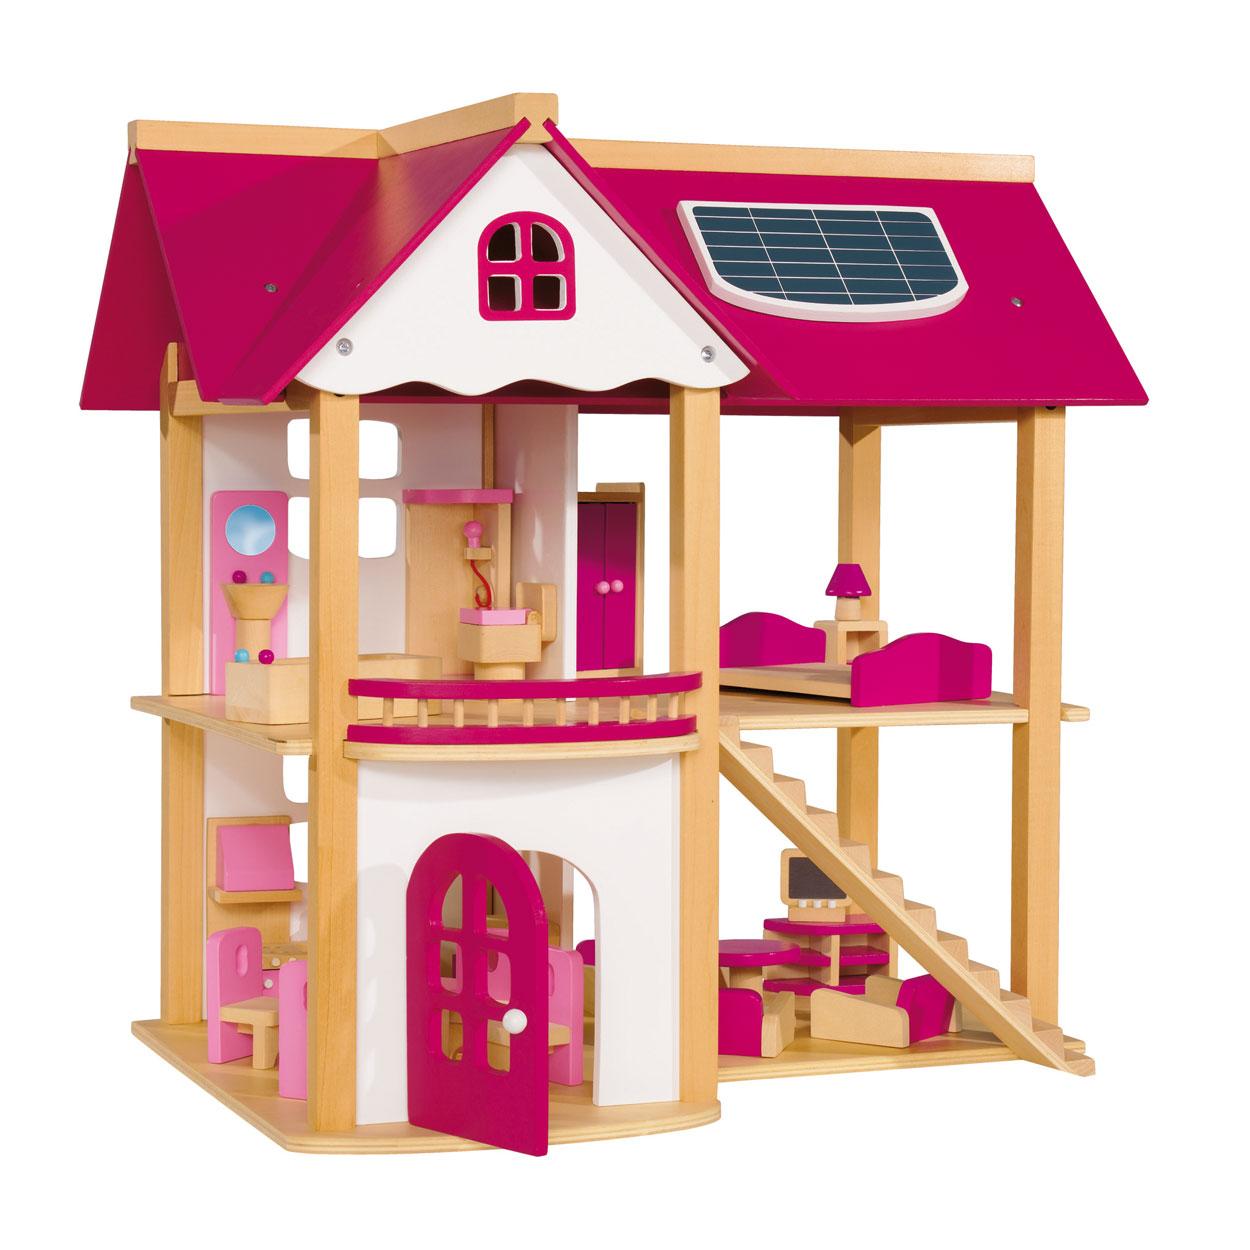 Beste Eichhorn Poppenhuis Groot online kopen | Lobbes Speelgoed XB-02